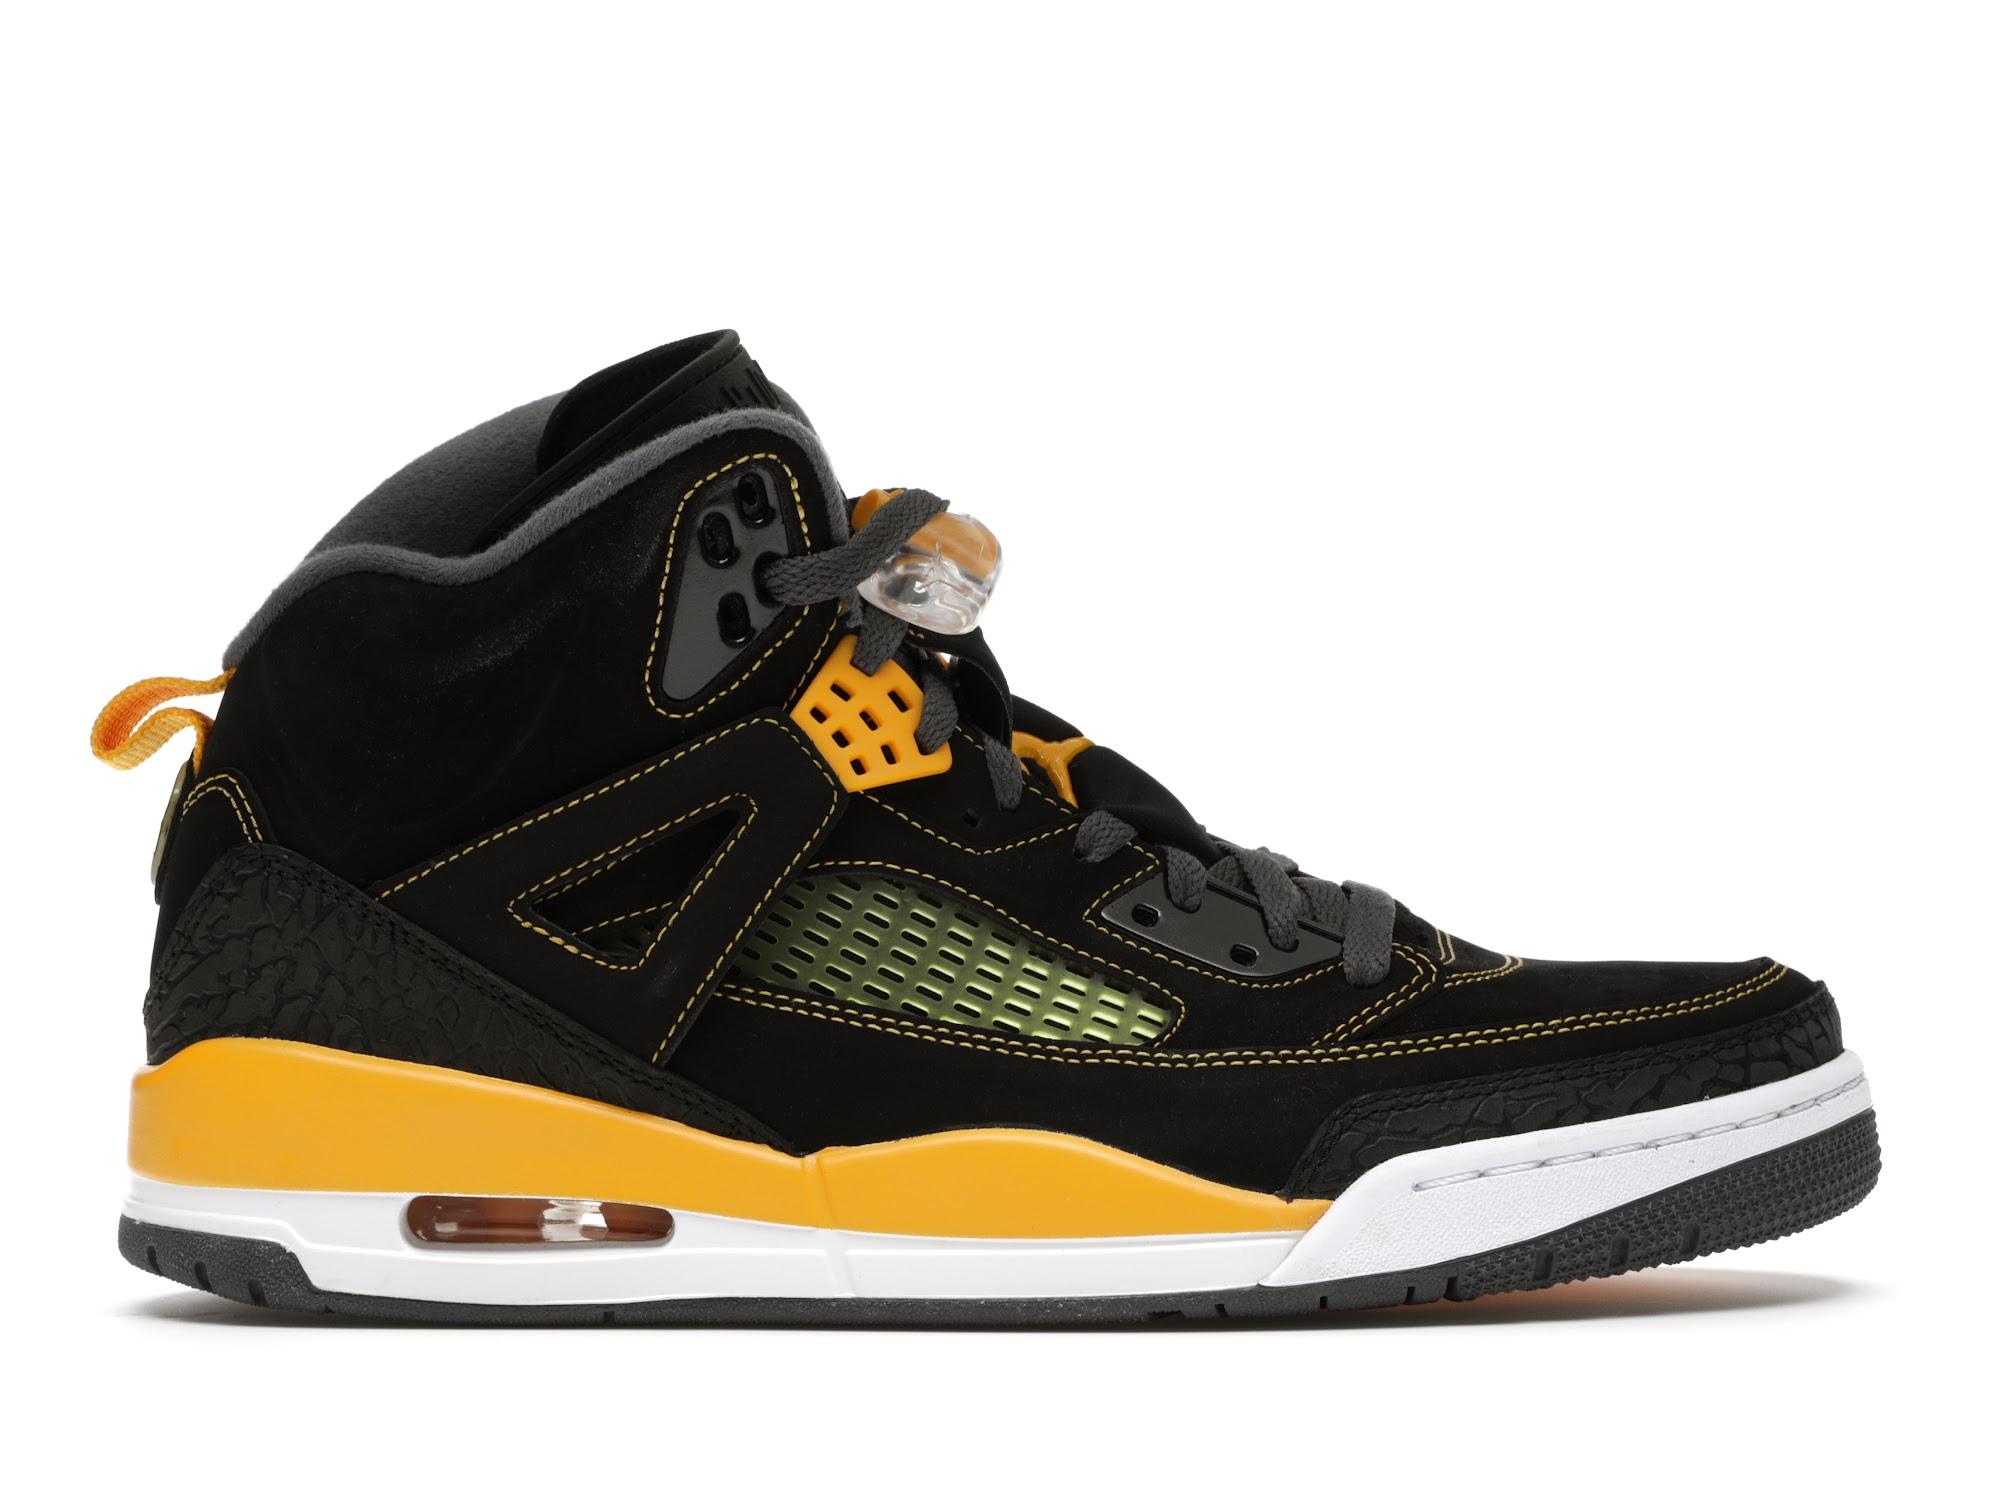 Jordan Spizike Black University Gold - 315371-030